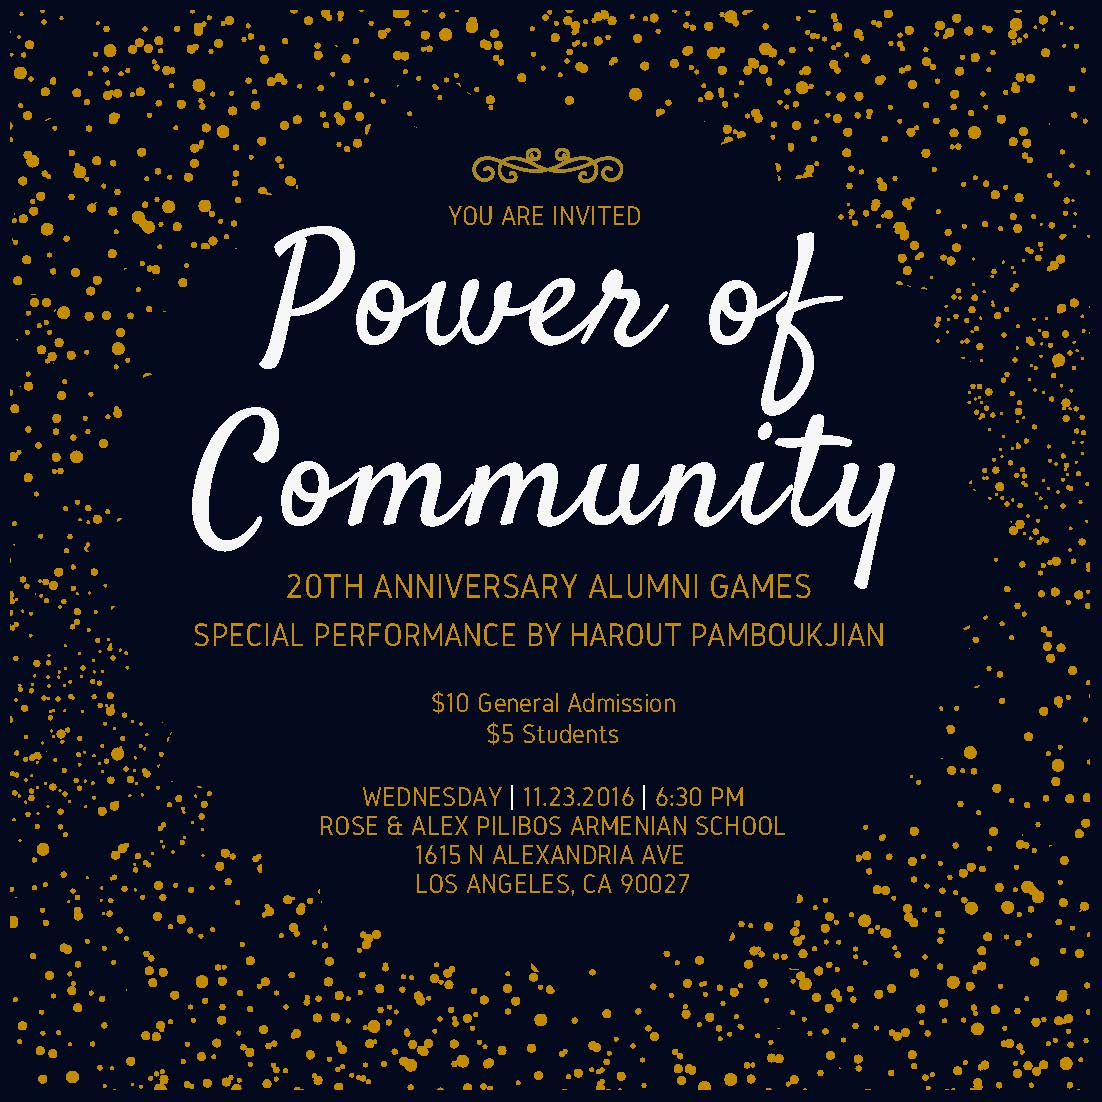 powerofcommunity2016new.jpg